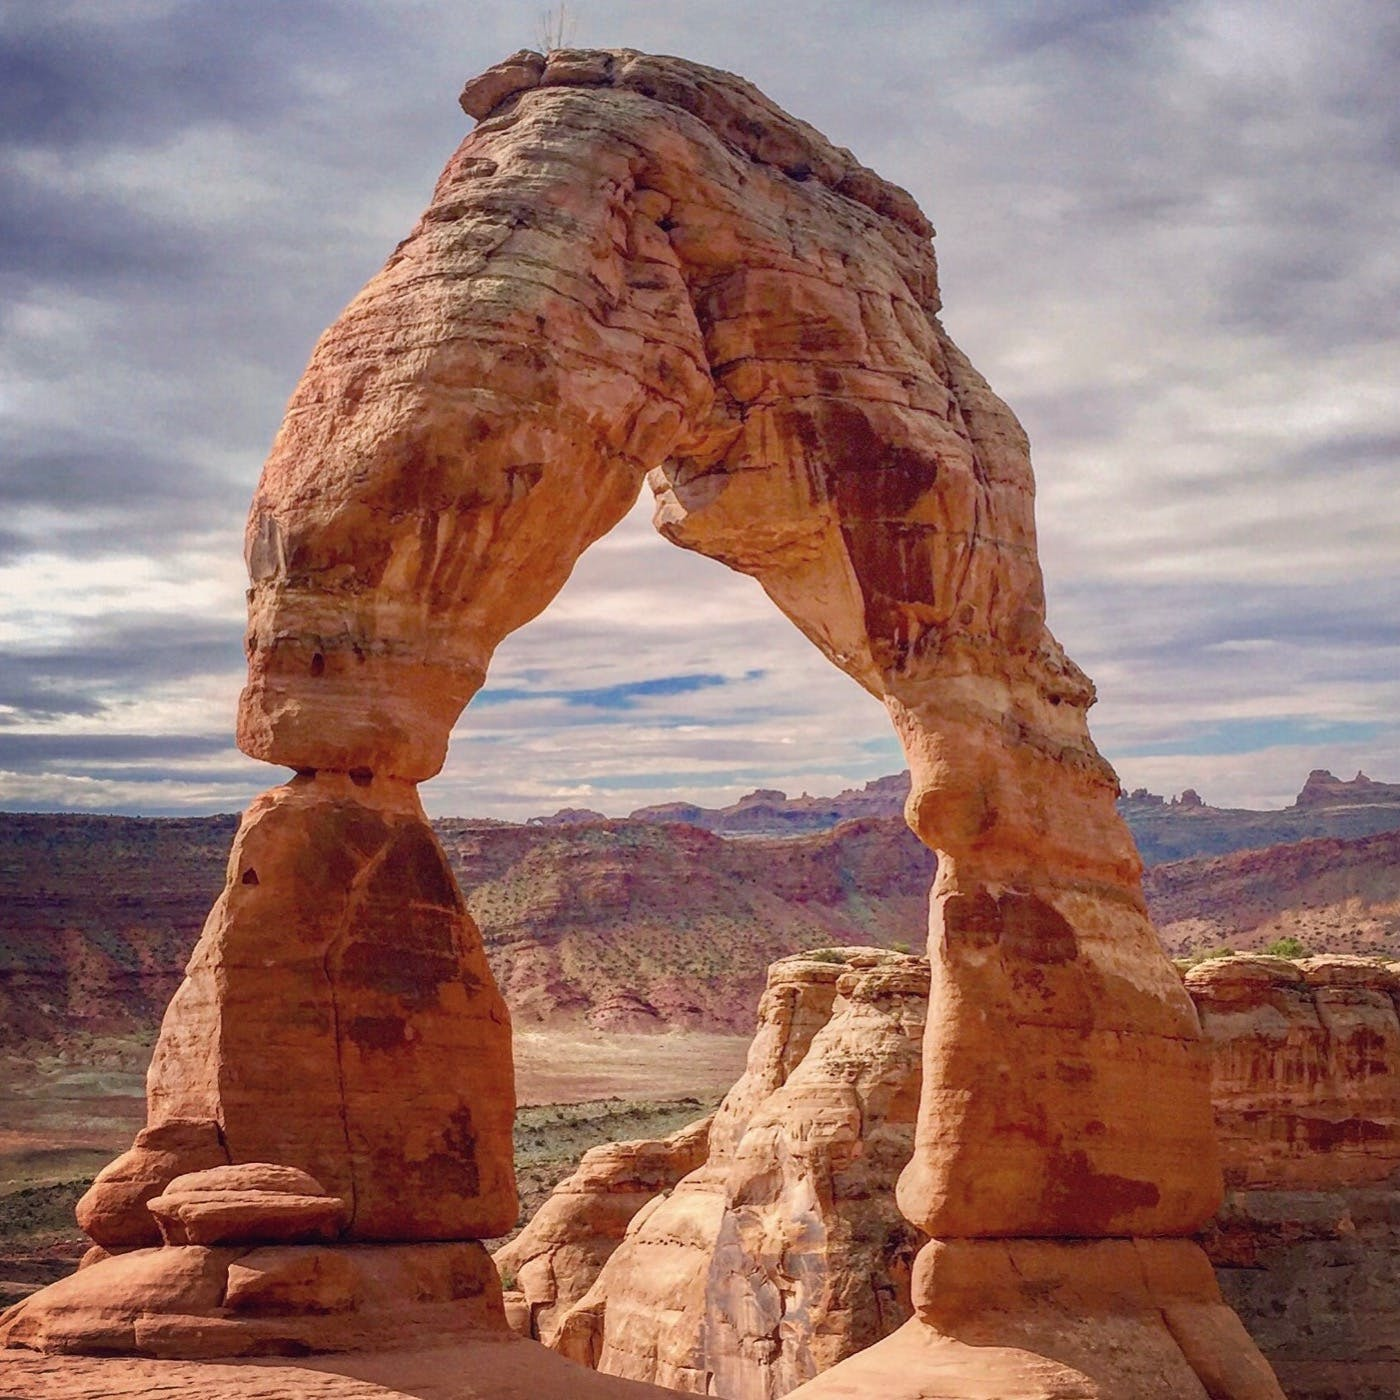 46 Twenty-Five National Parks to Visit in Your Lifetime